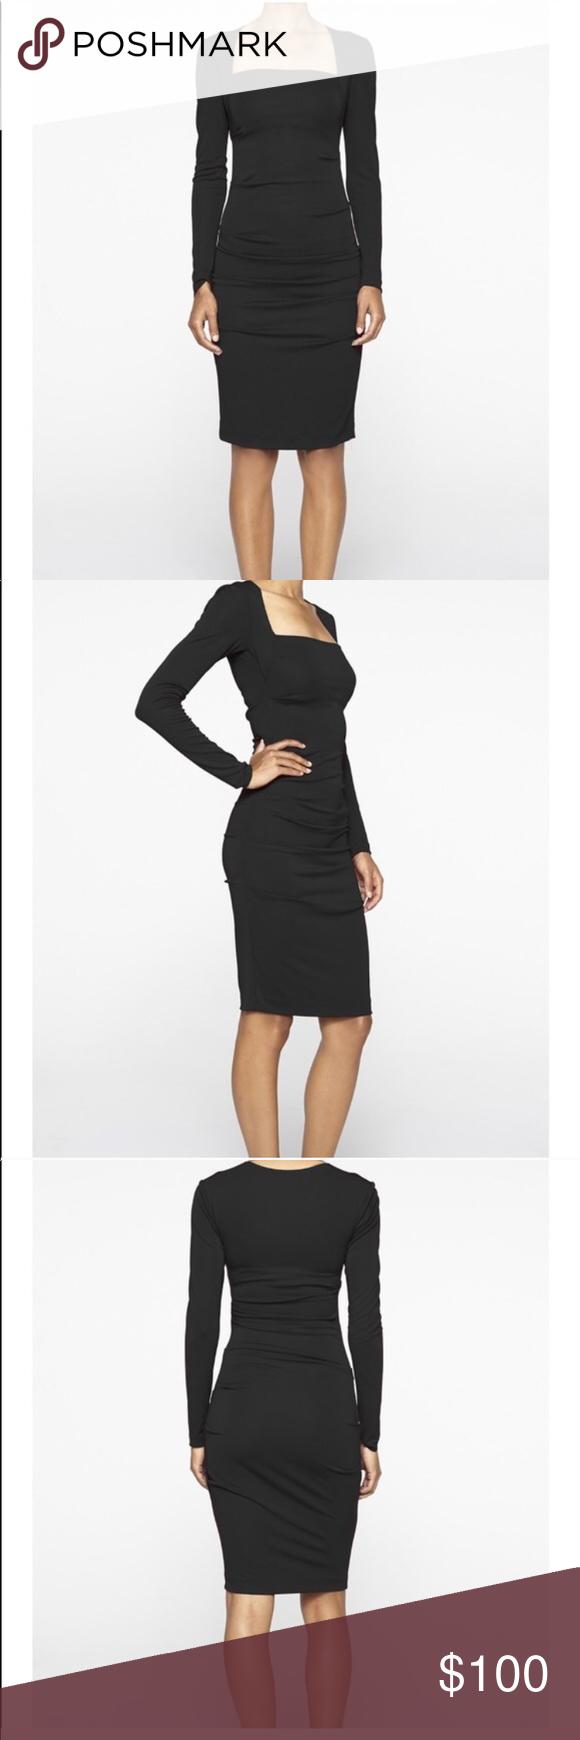 Nicole miller felicity dress nicole miller customer support and